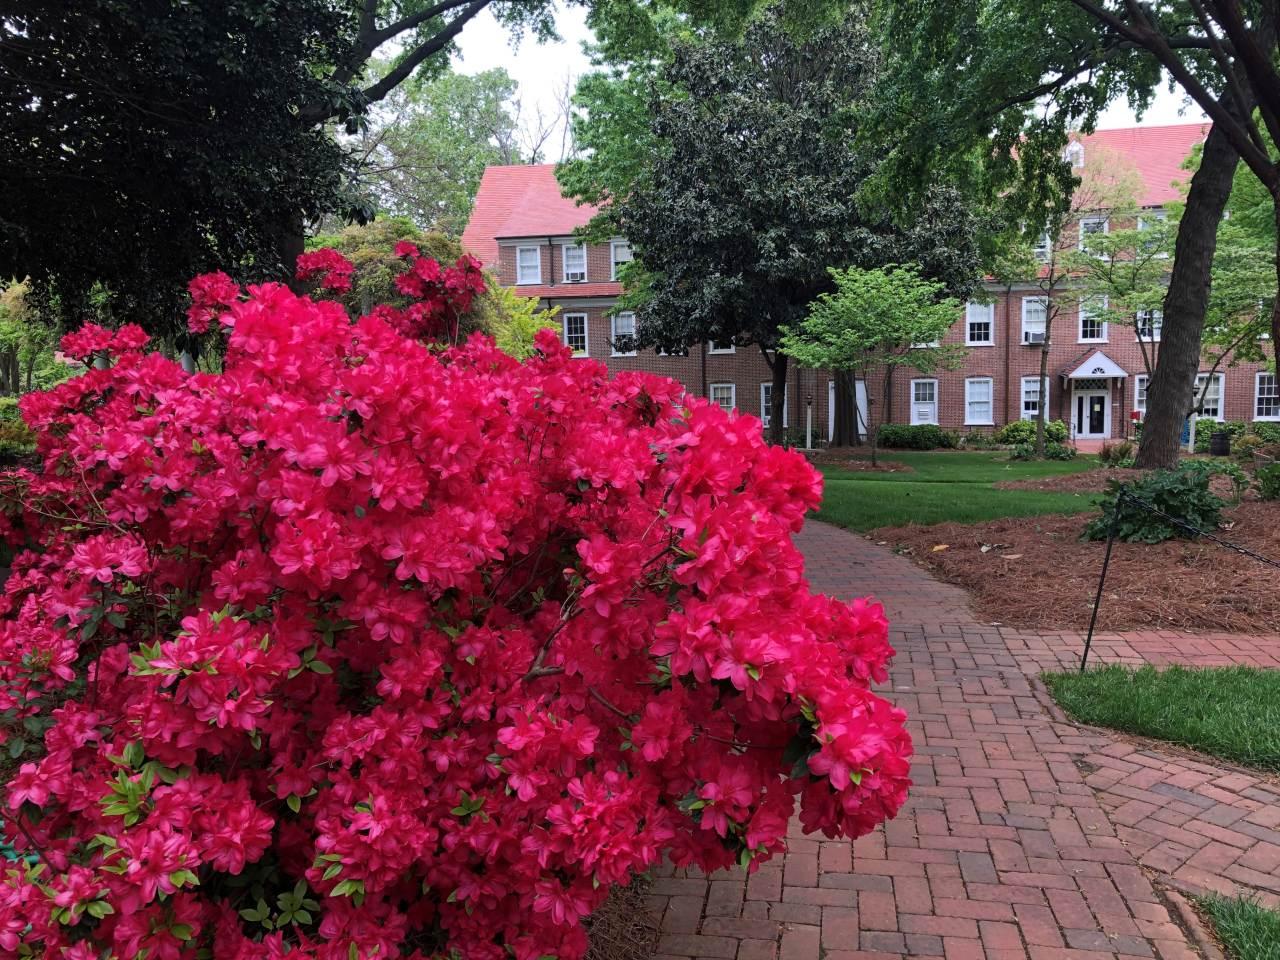 red azaleas in bloom on campus